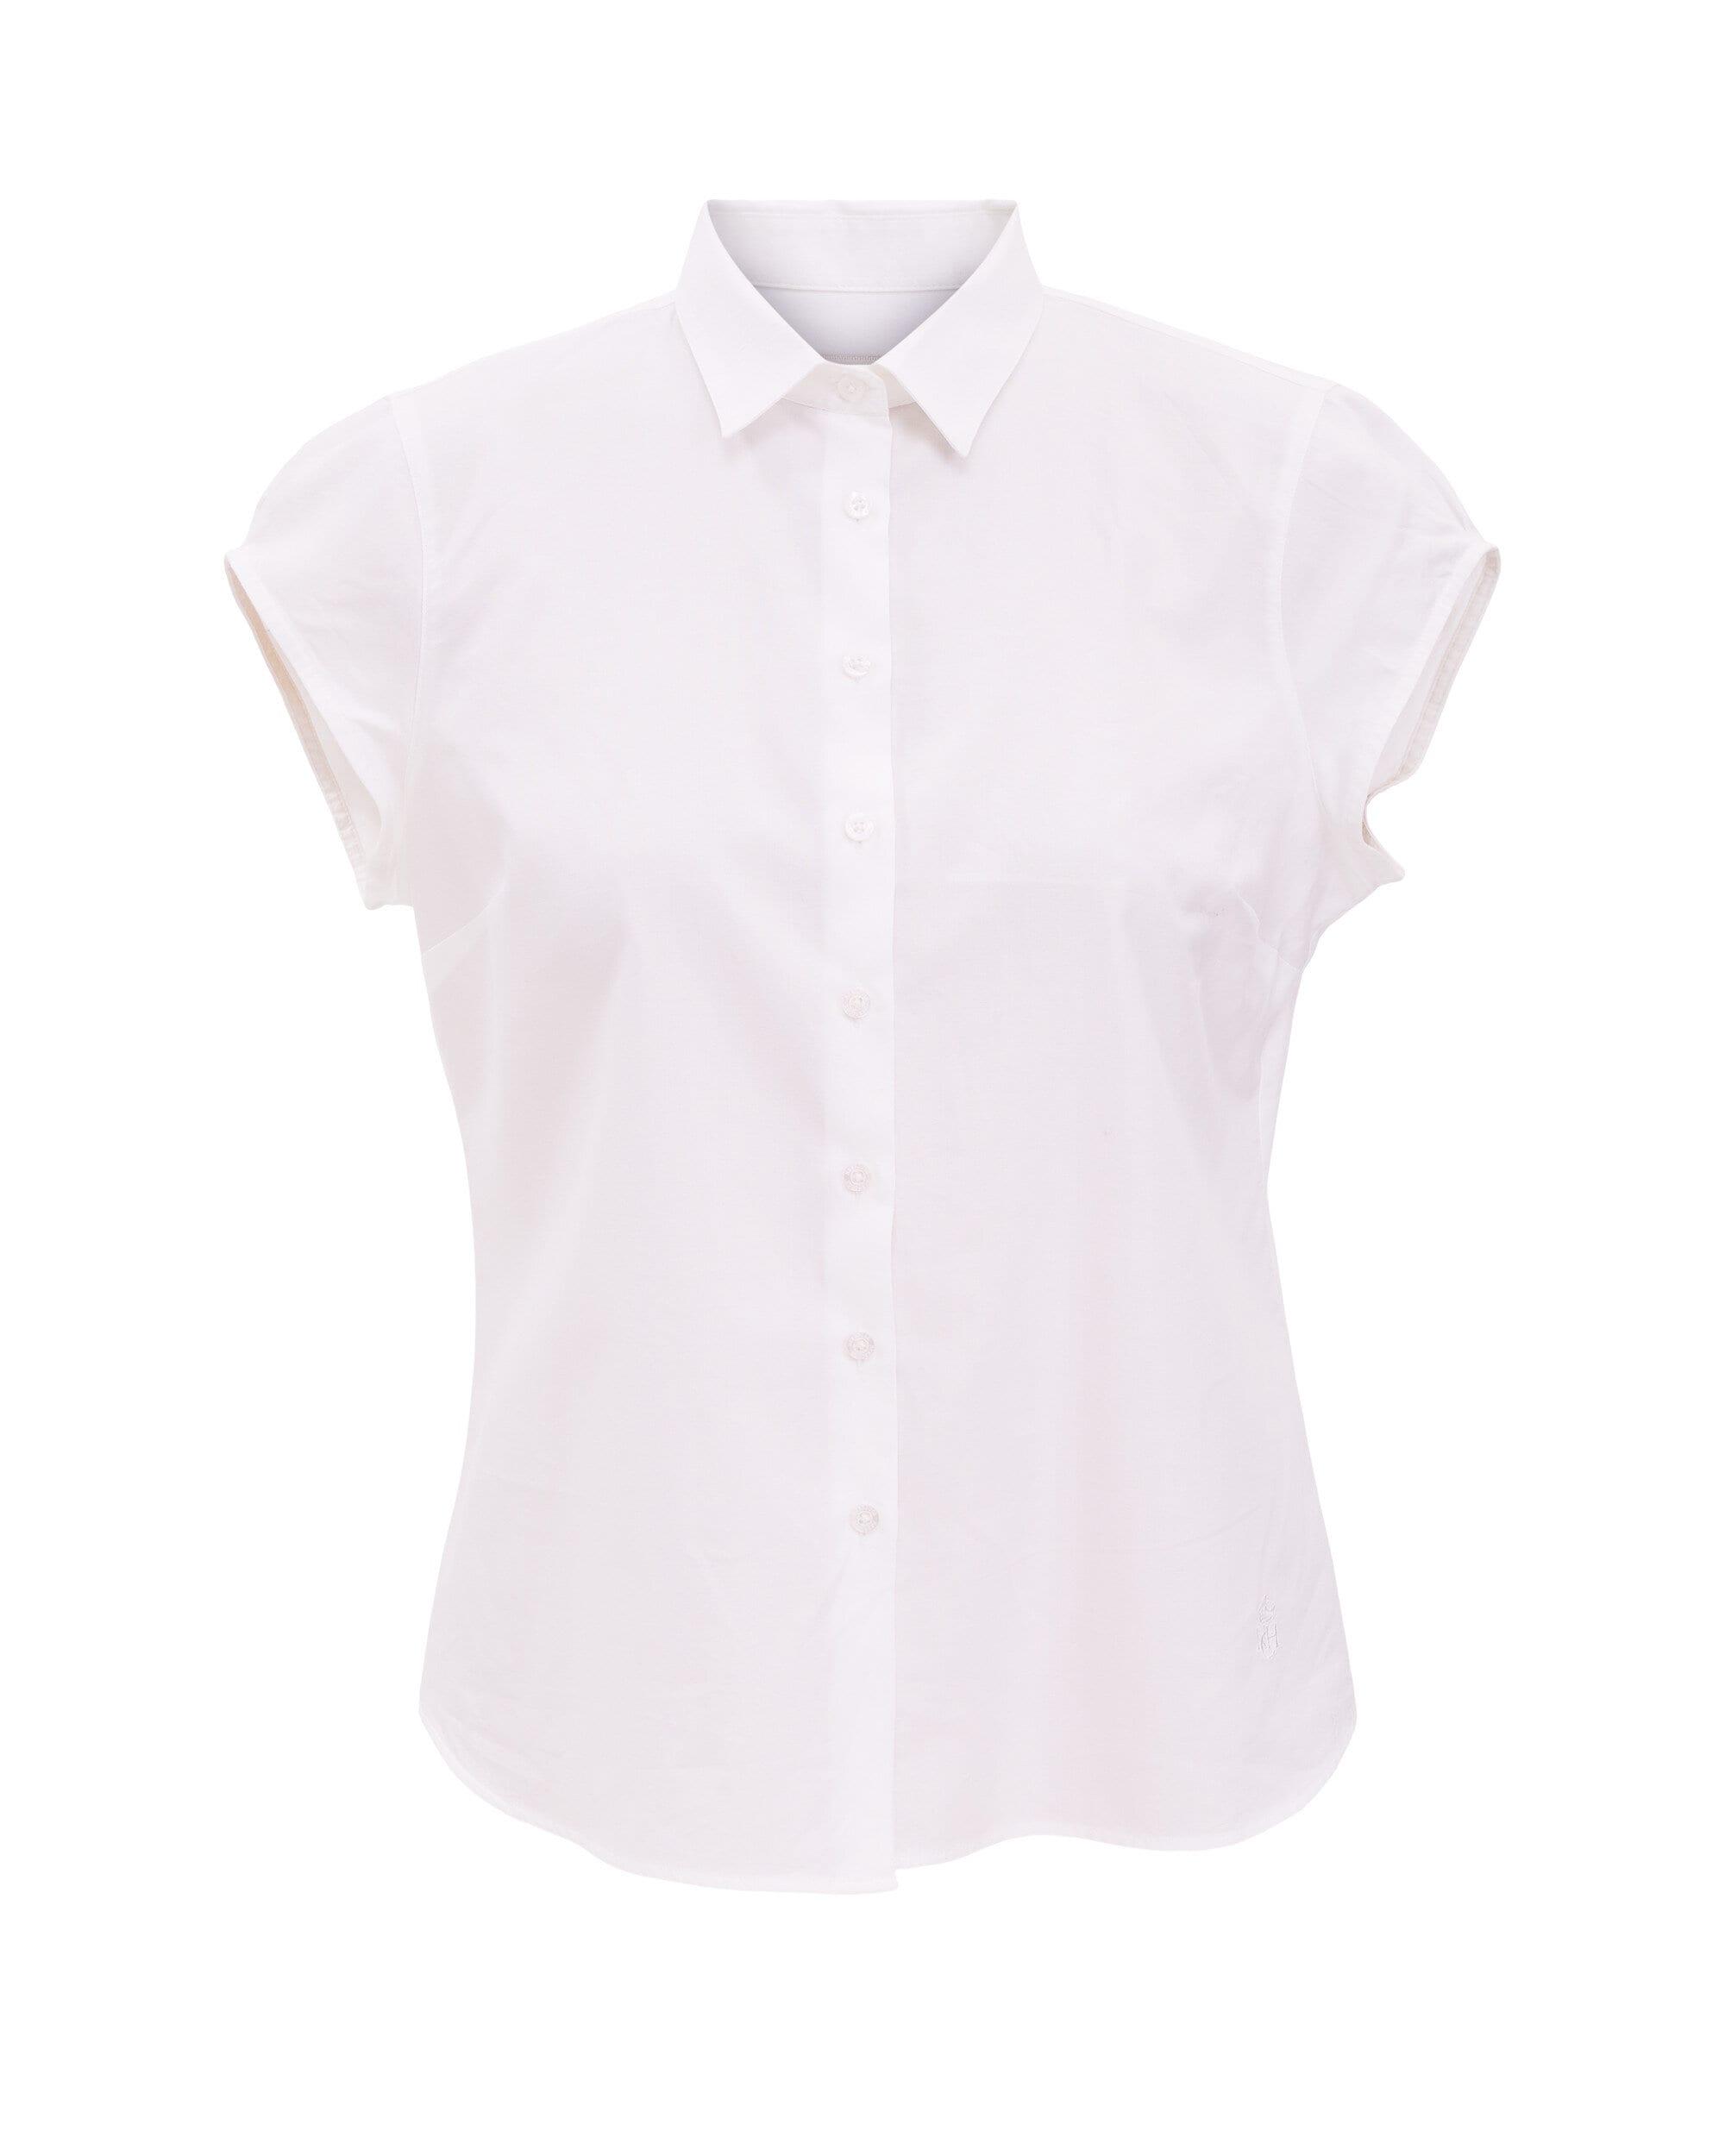 Sicily White Shirt